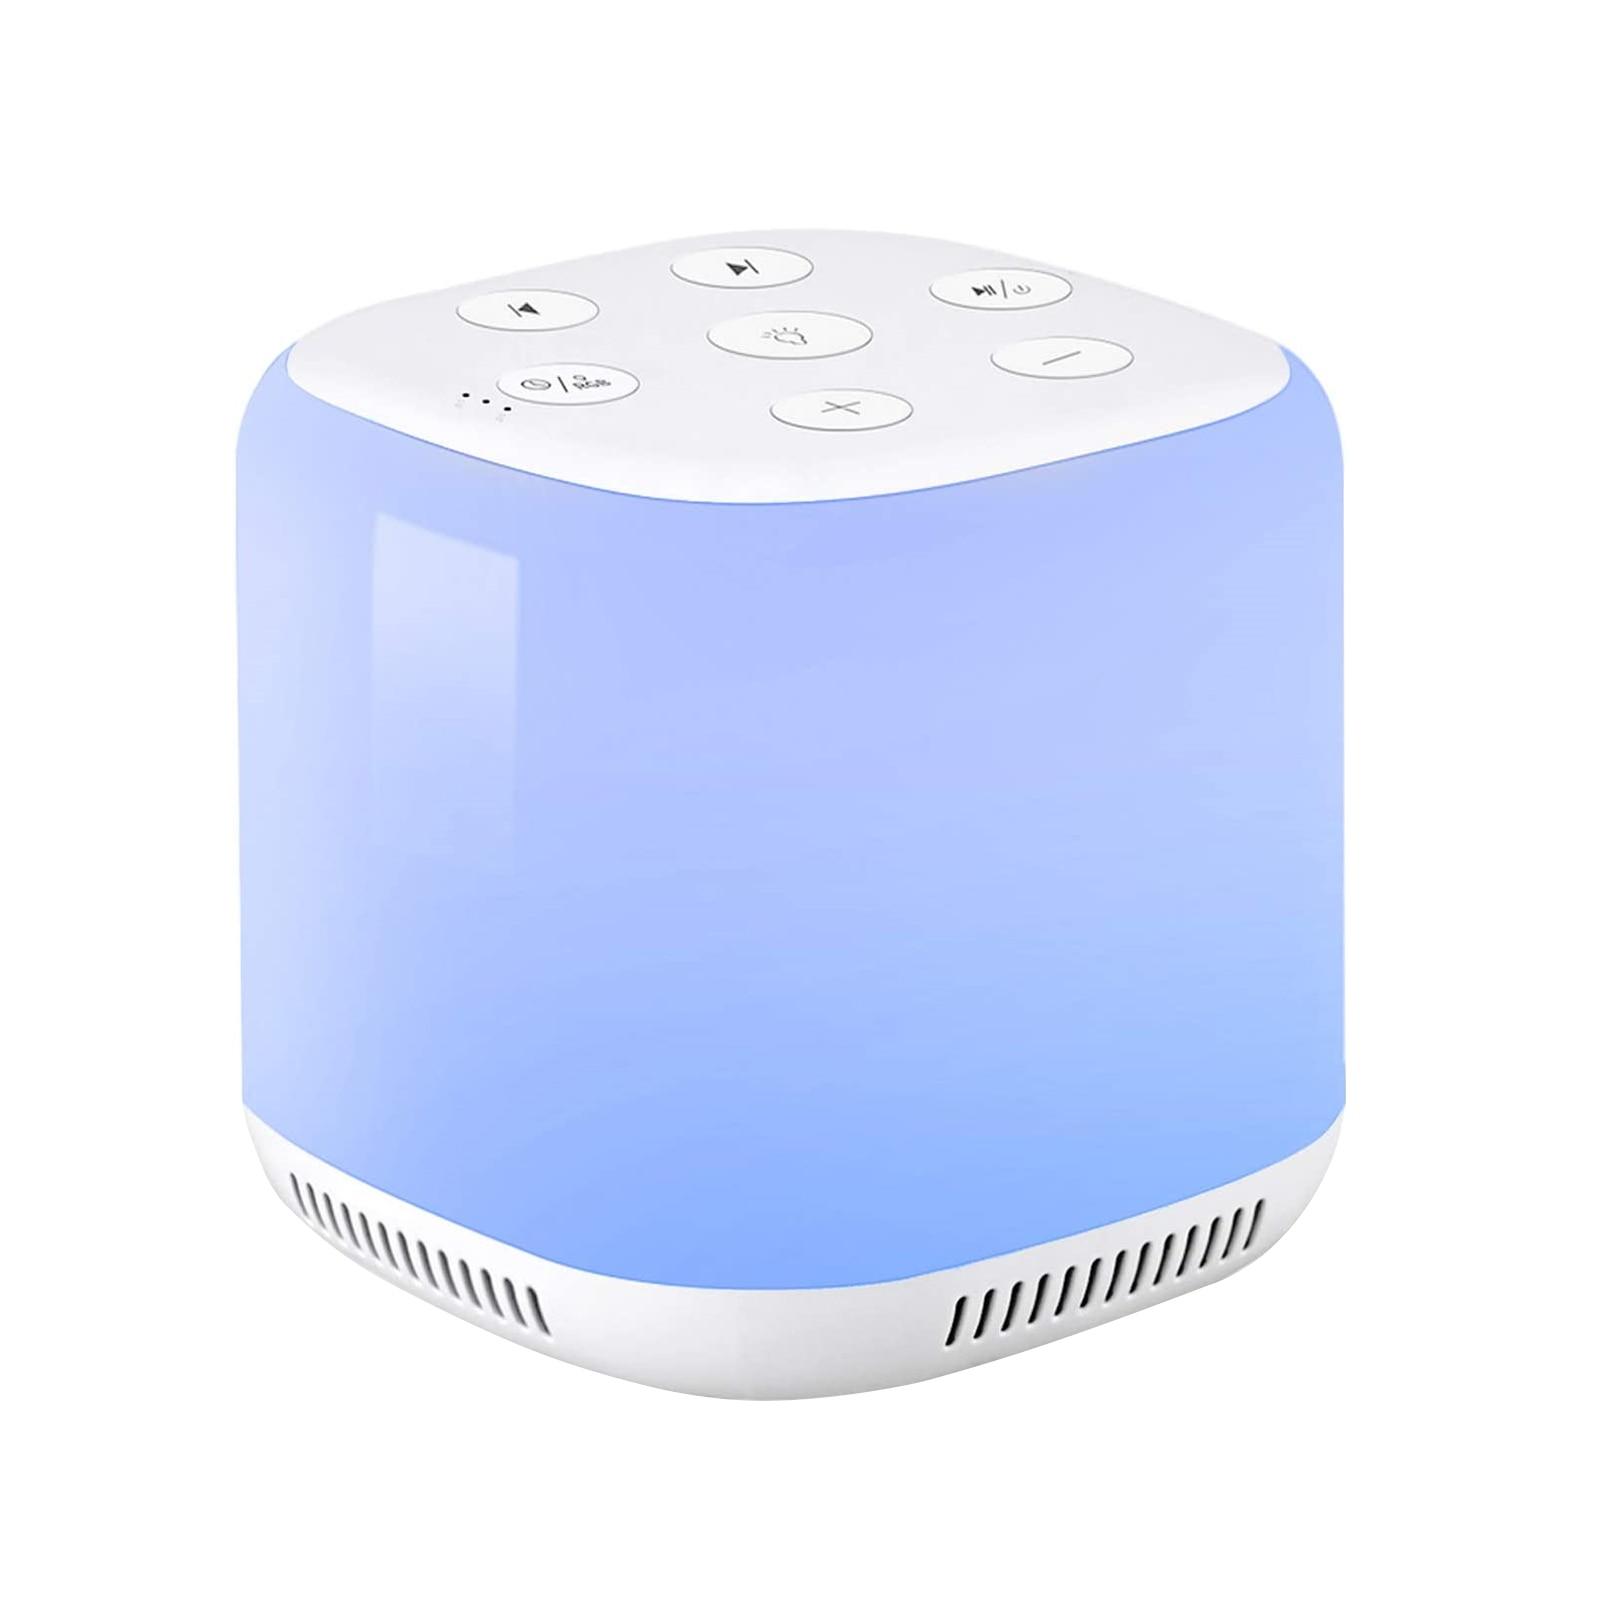 baby-white-noise-machine-usb-rechargeable-timed-shutdown-sleep-machine-baby-sleep-sound-player-night-light-timer-noise-player